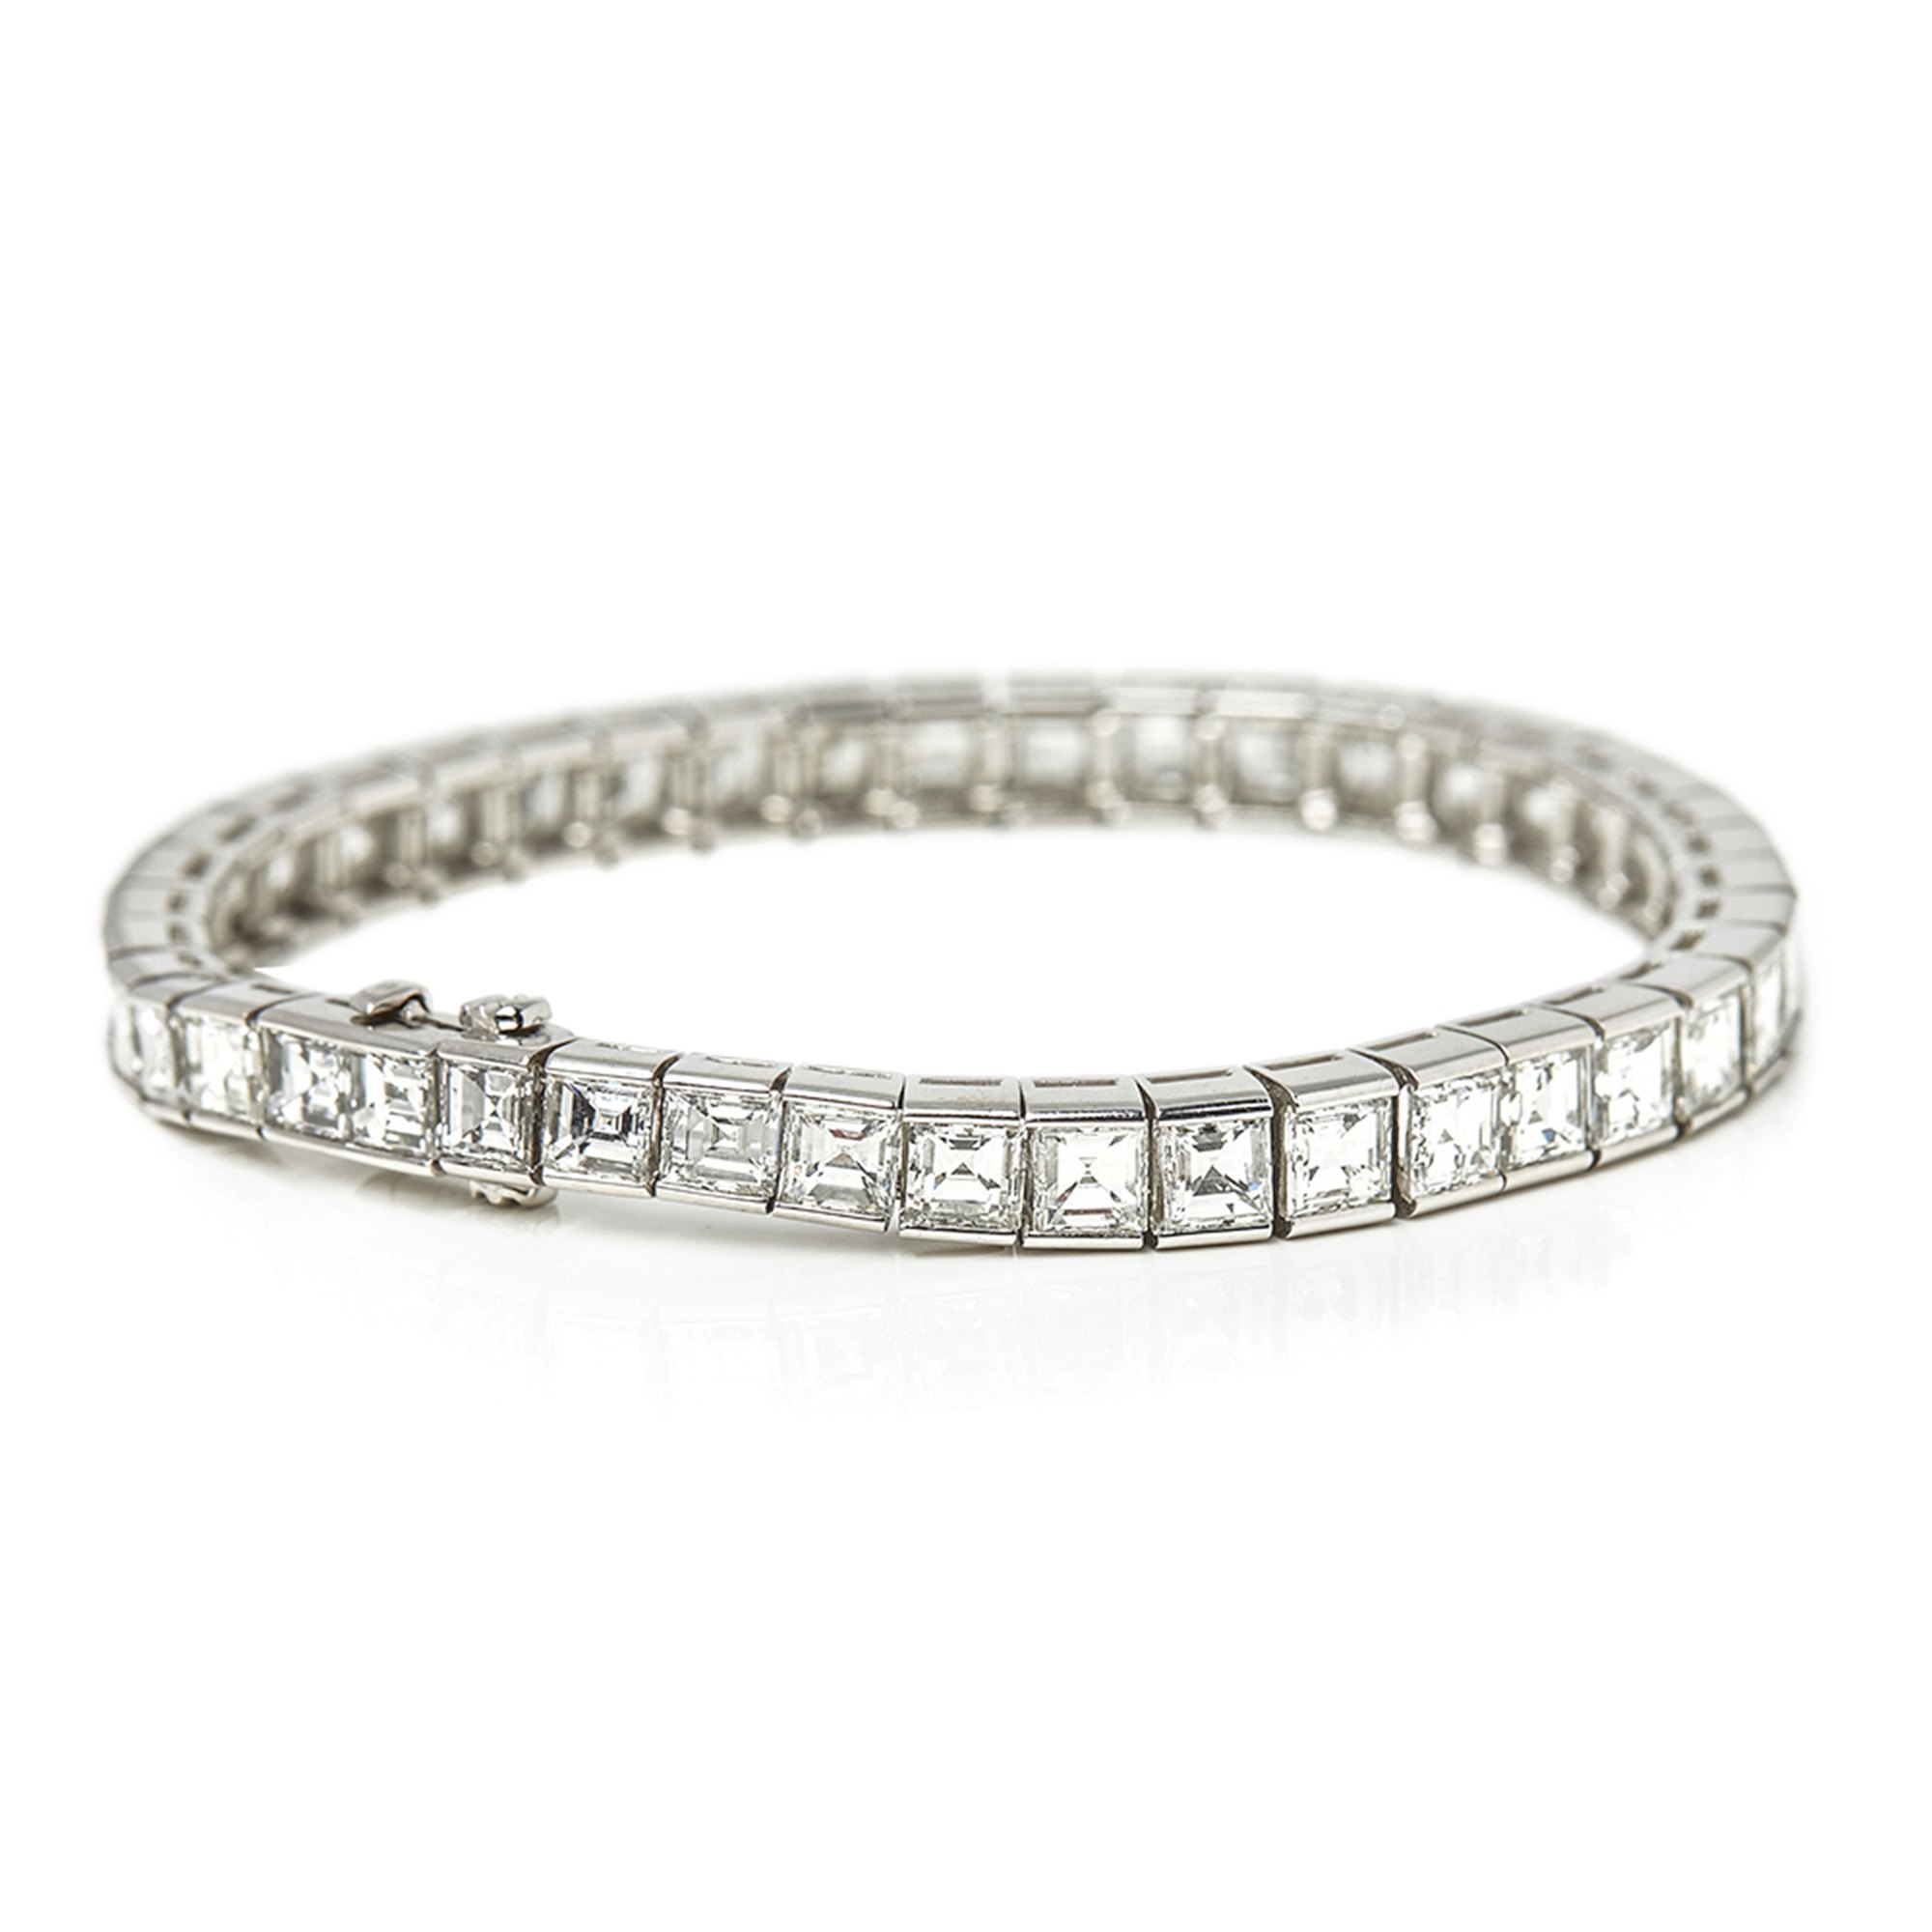 Cartier Platinum Emerald Cut Diamond